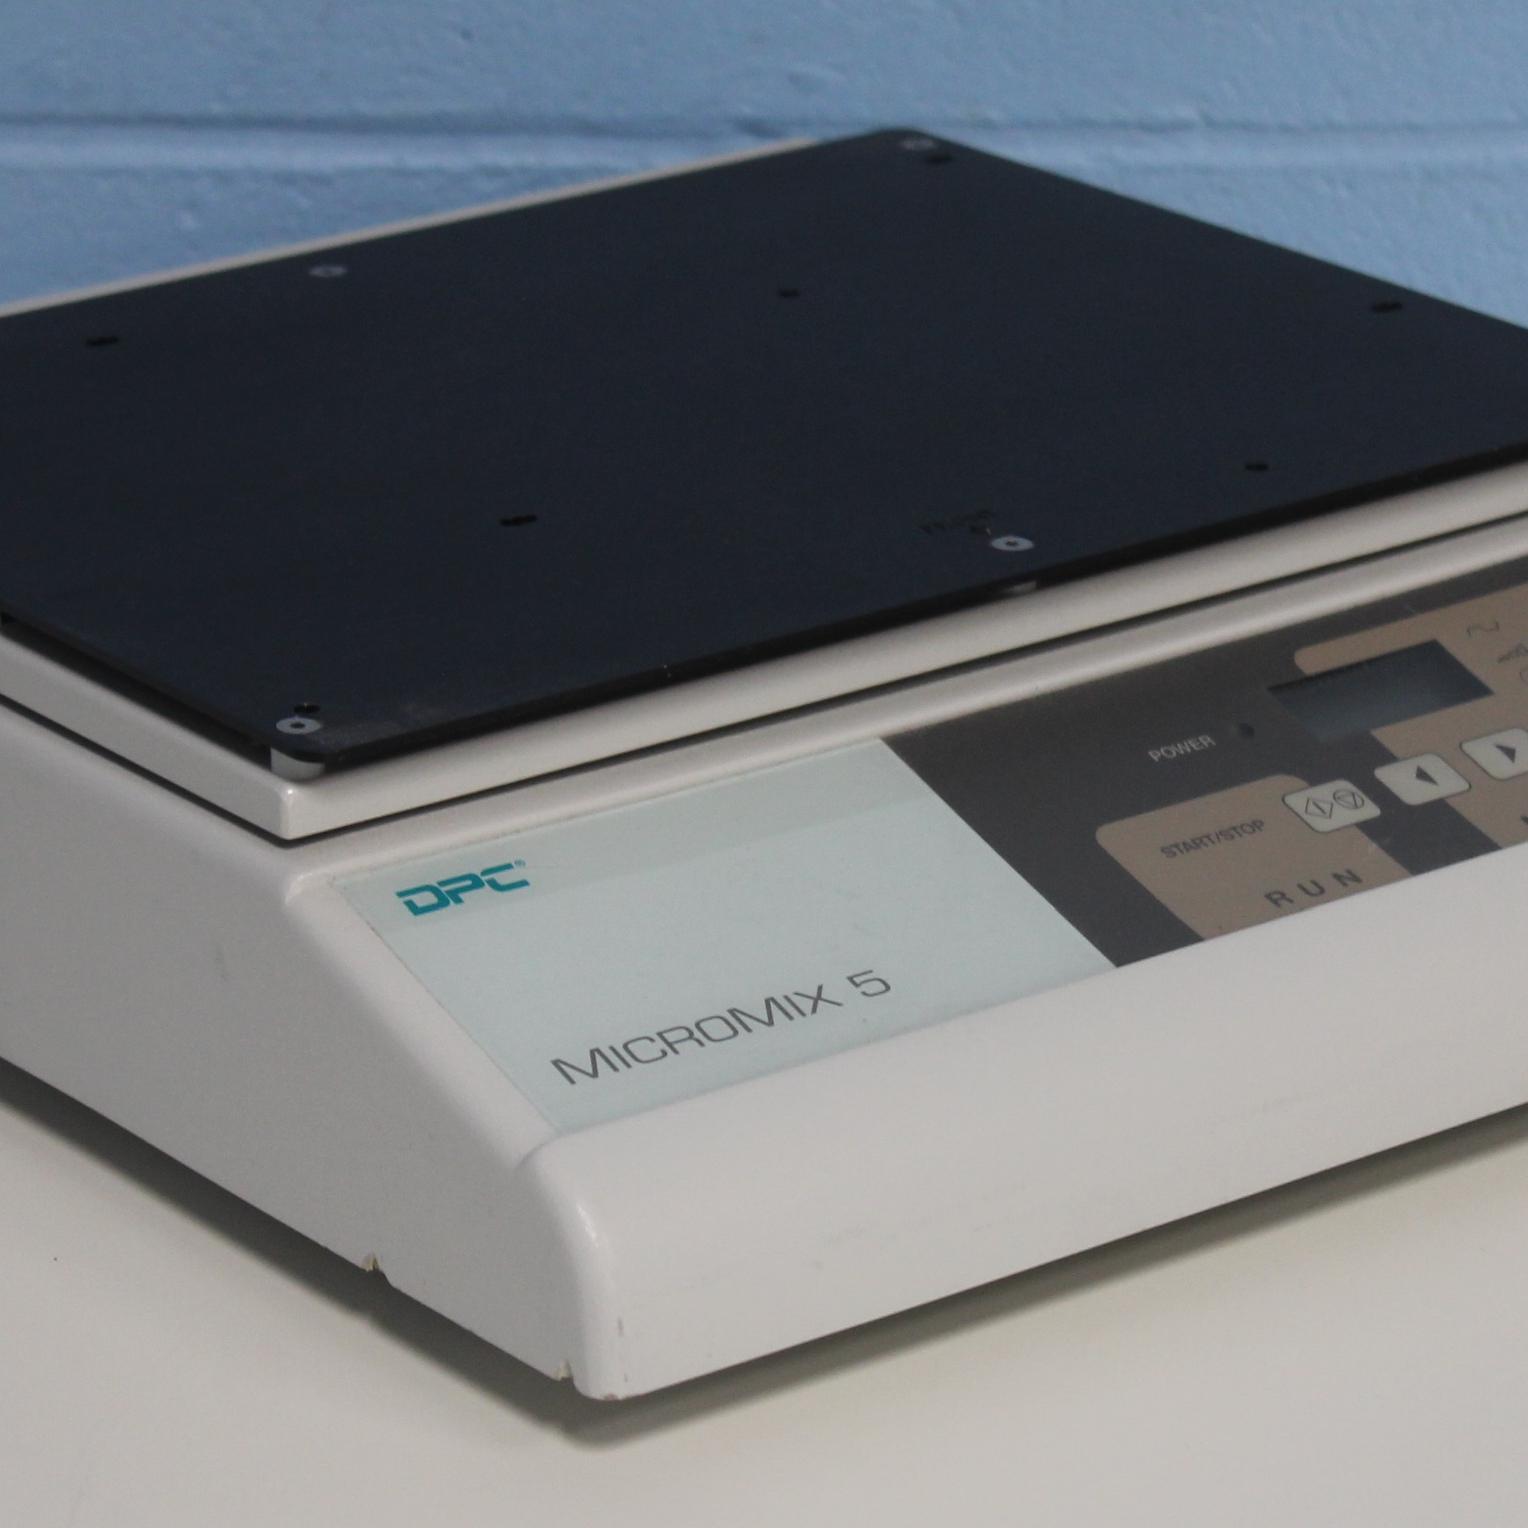 DPC Micromix 5 Shaker Image